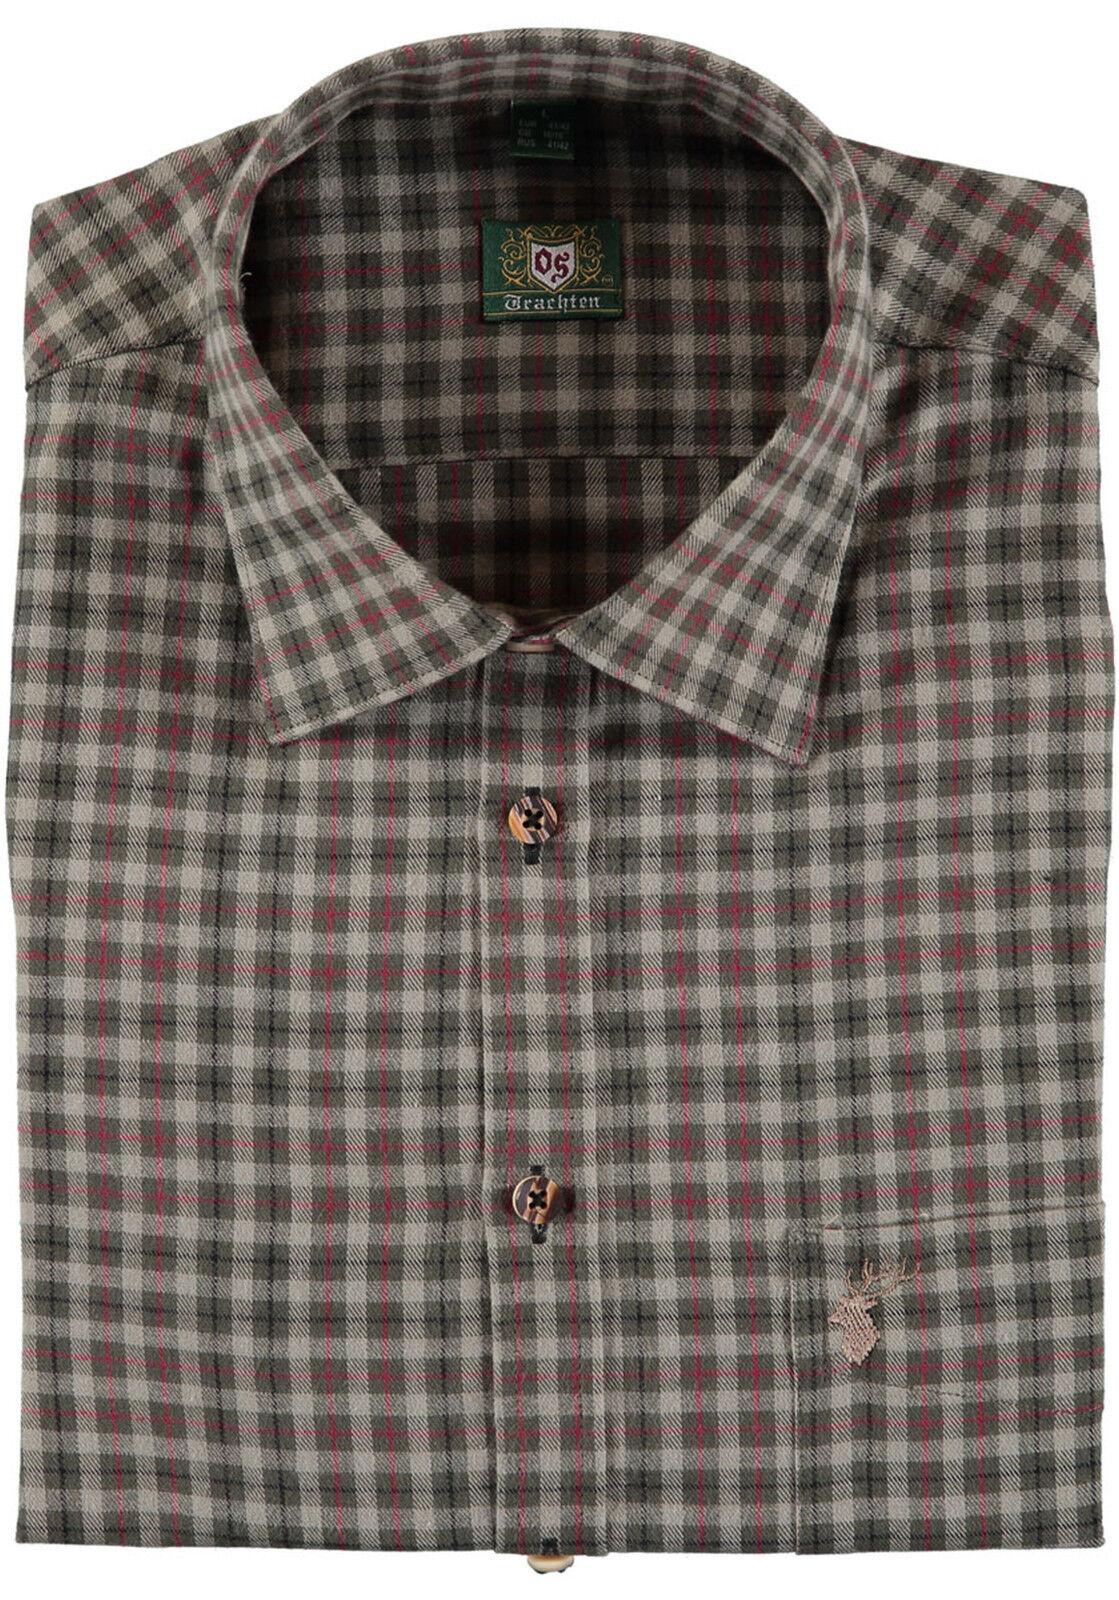 Orbis os Trachten camisa 3631 55 caballeros caza camisa  wanderhemd Karo camisa manga larga  envío rápido en todo el mundo